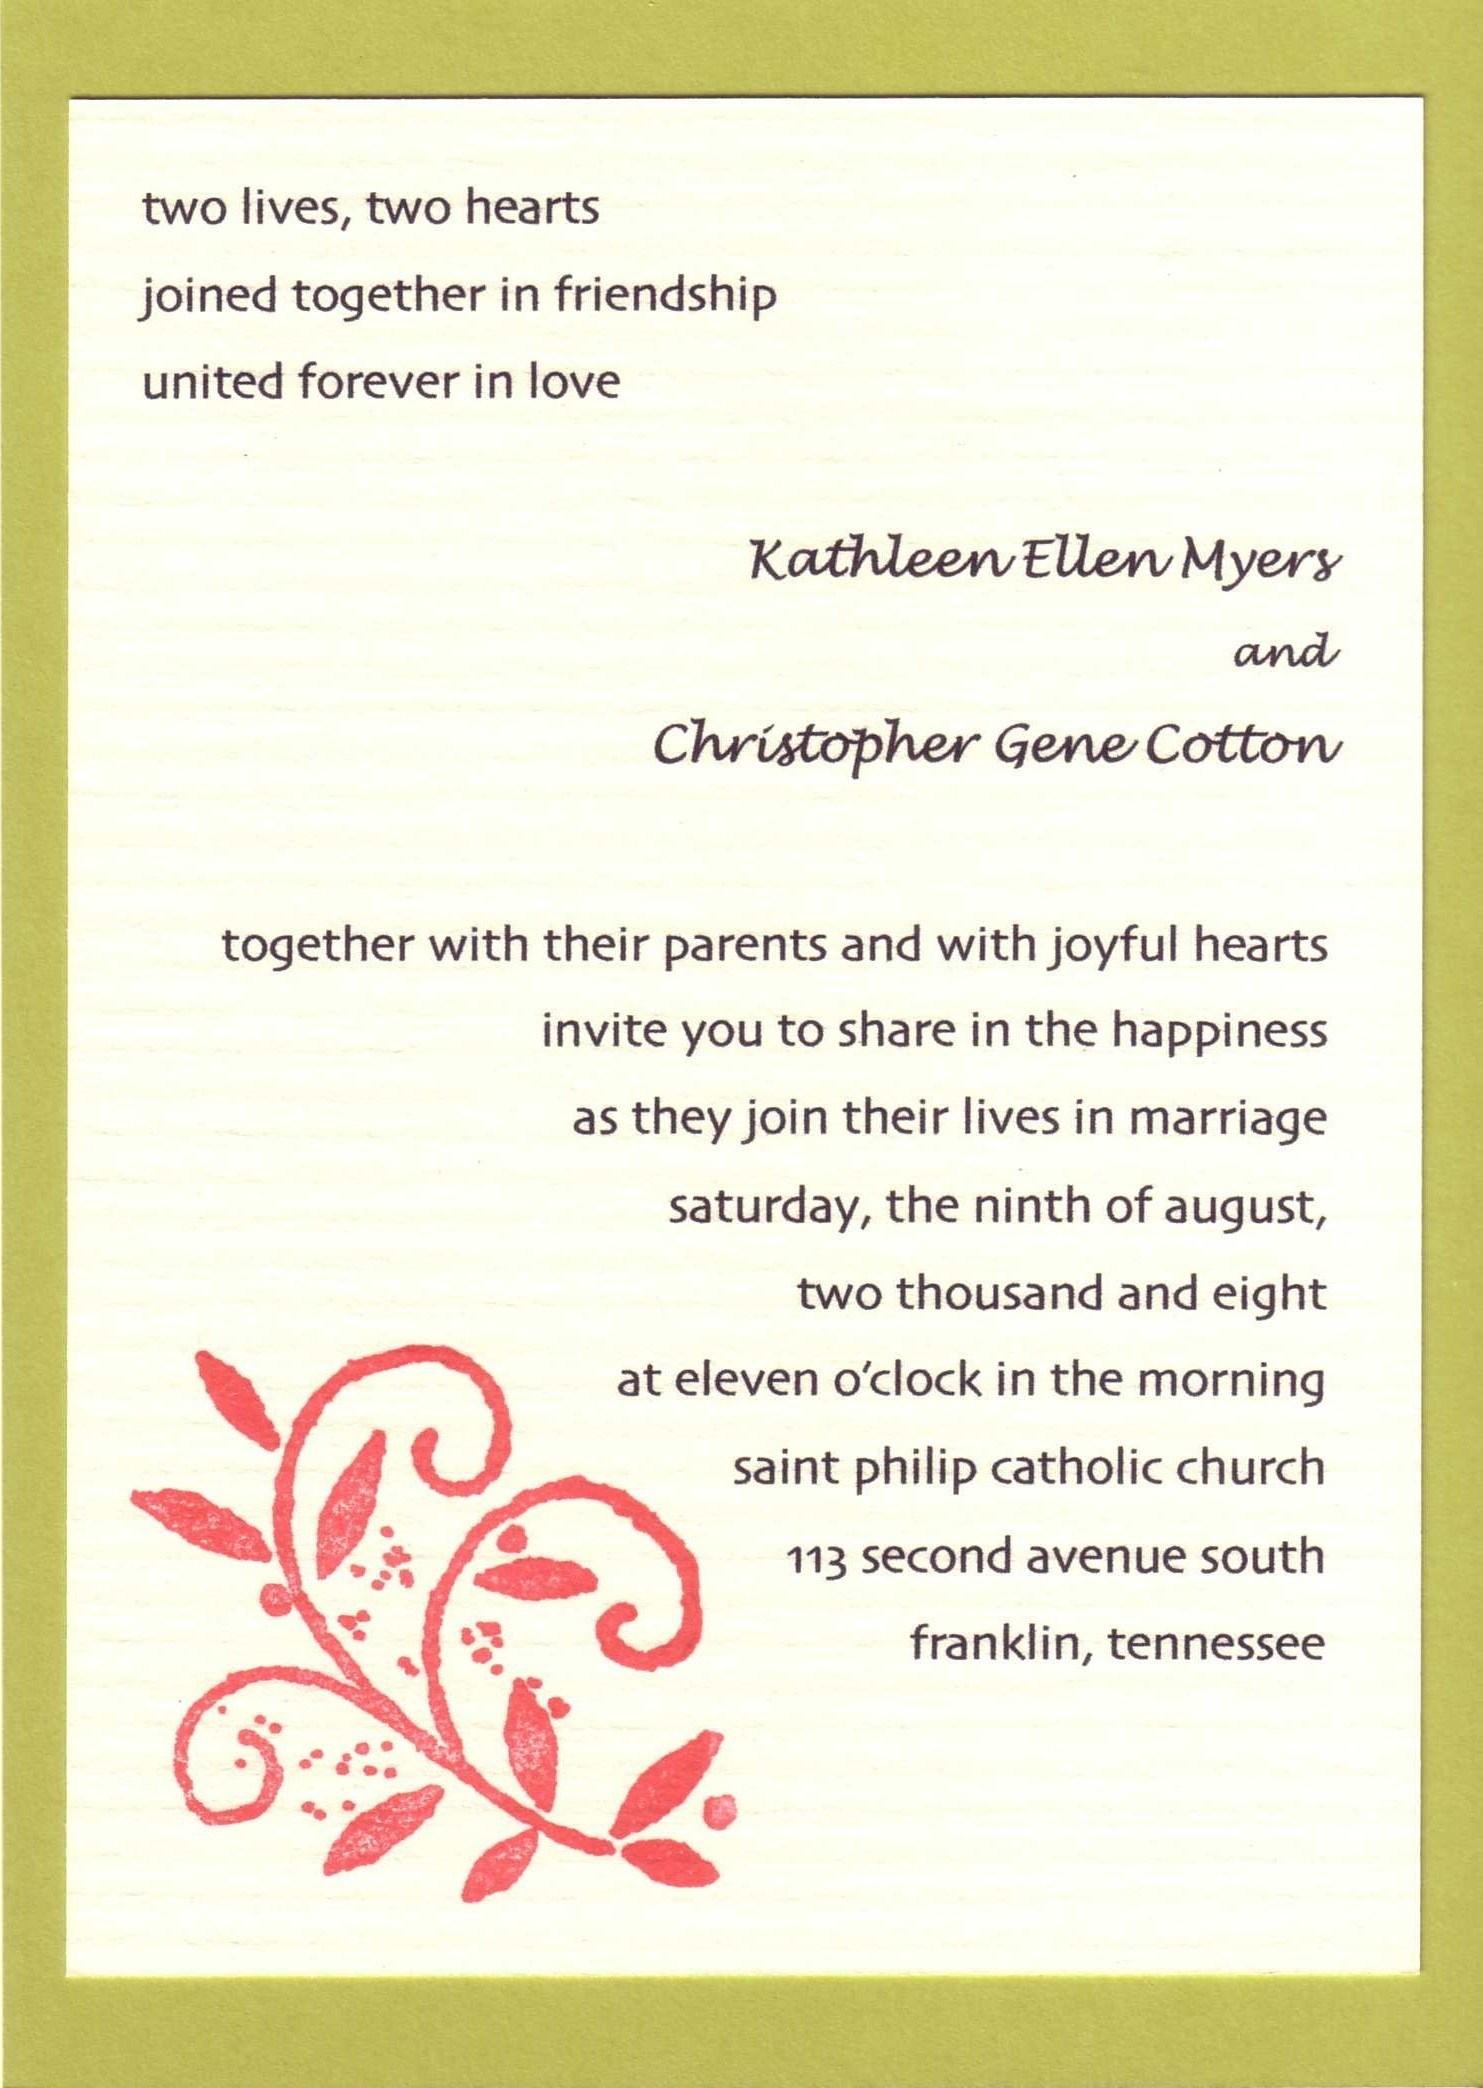 Wedding Invitations Wording Samples Wedding Invitation Sayings